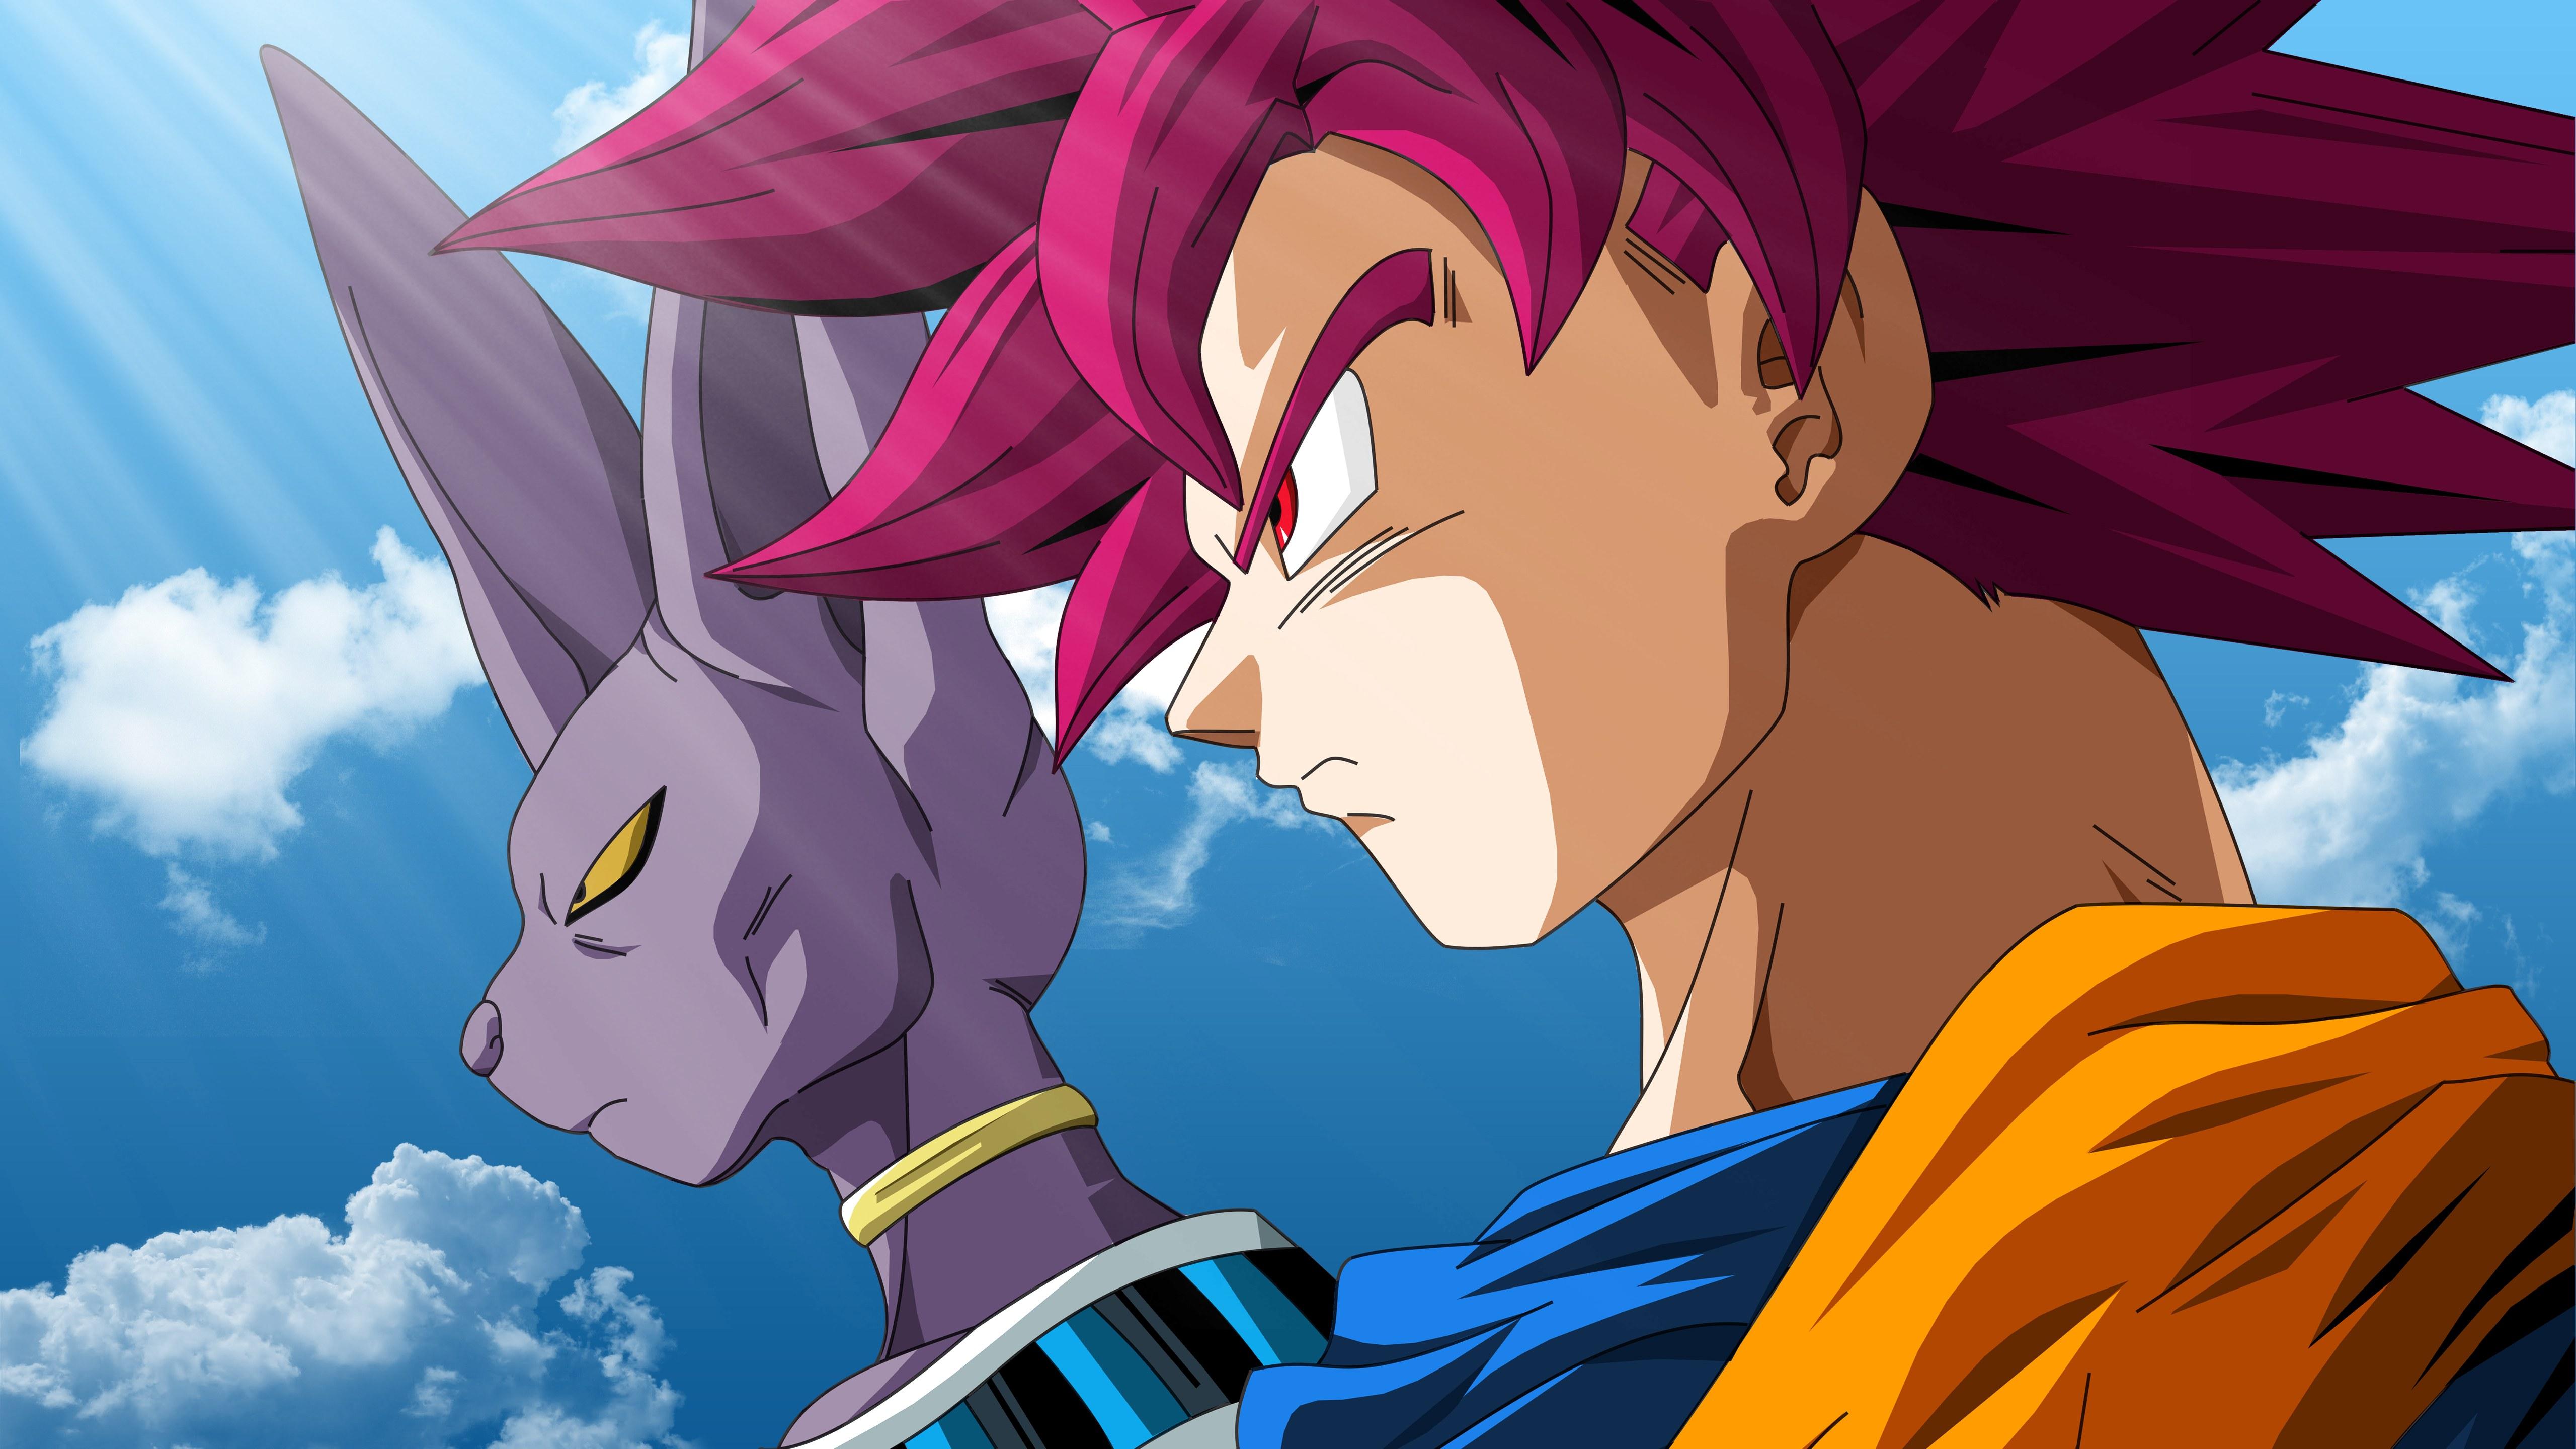 Fondos de pantalla Anime Beerus y Goku Super Saiyan God